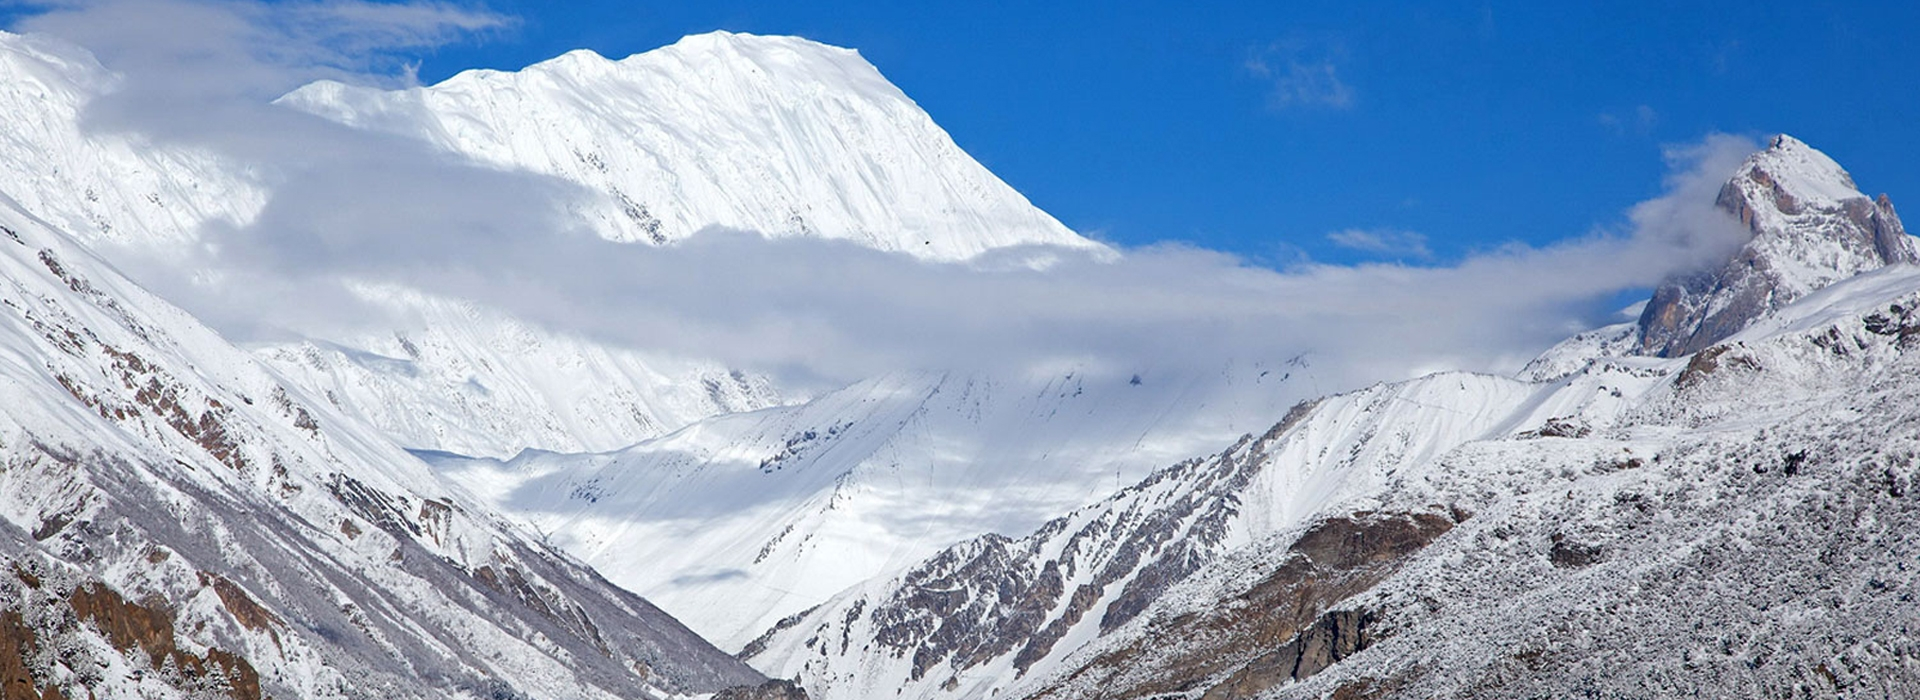 Nepal Manang Tilicho Lake Trek- World's Highest Lake